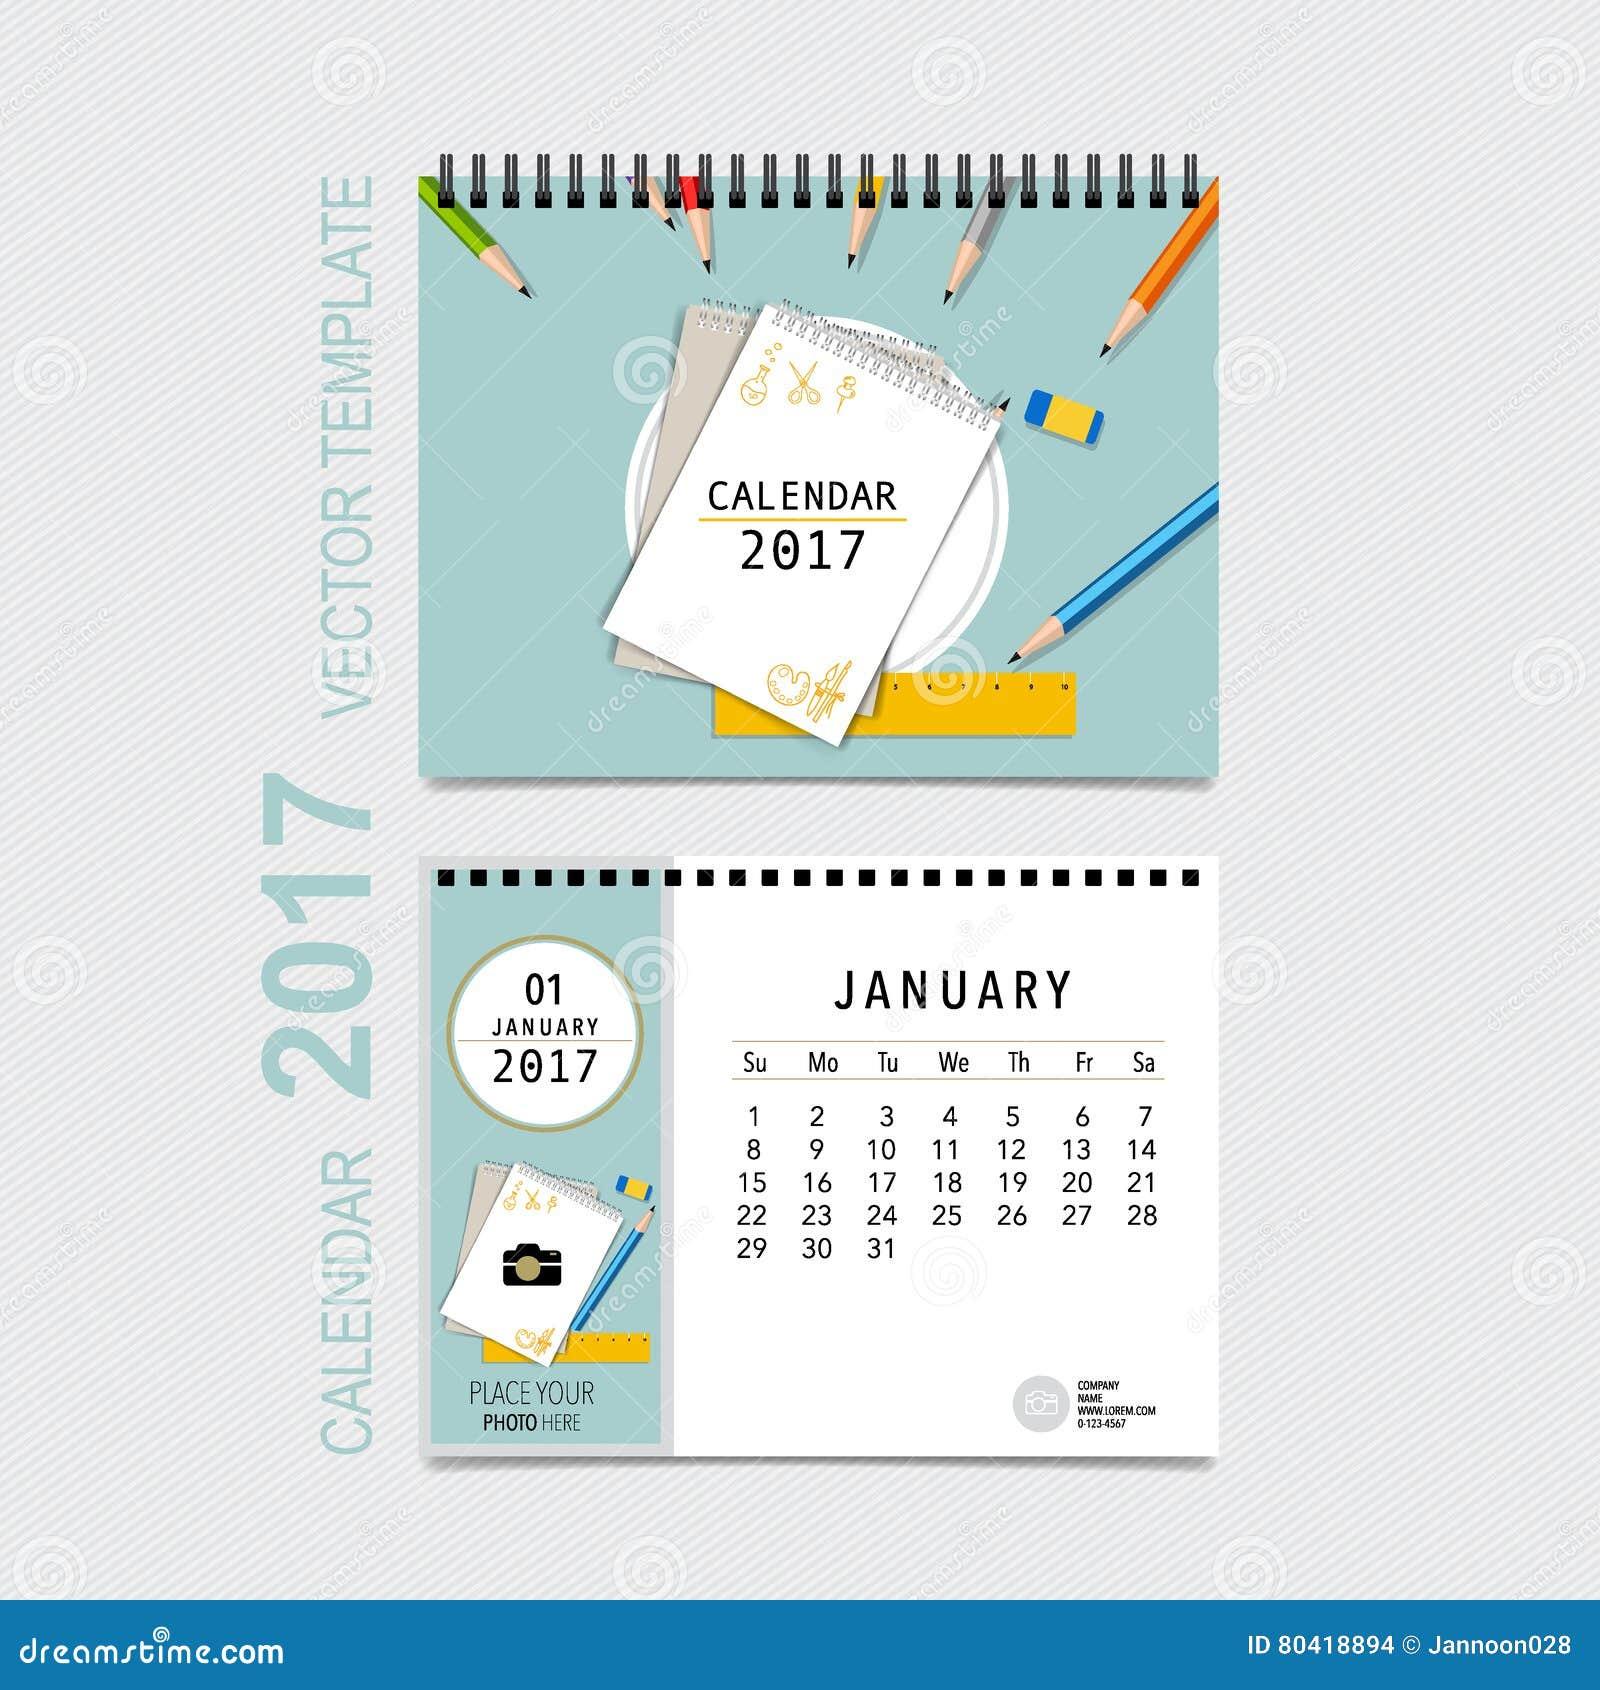 January Calendar Planner : Calendar planner vector design monthly